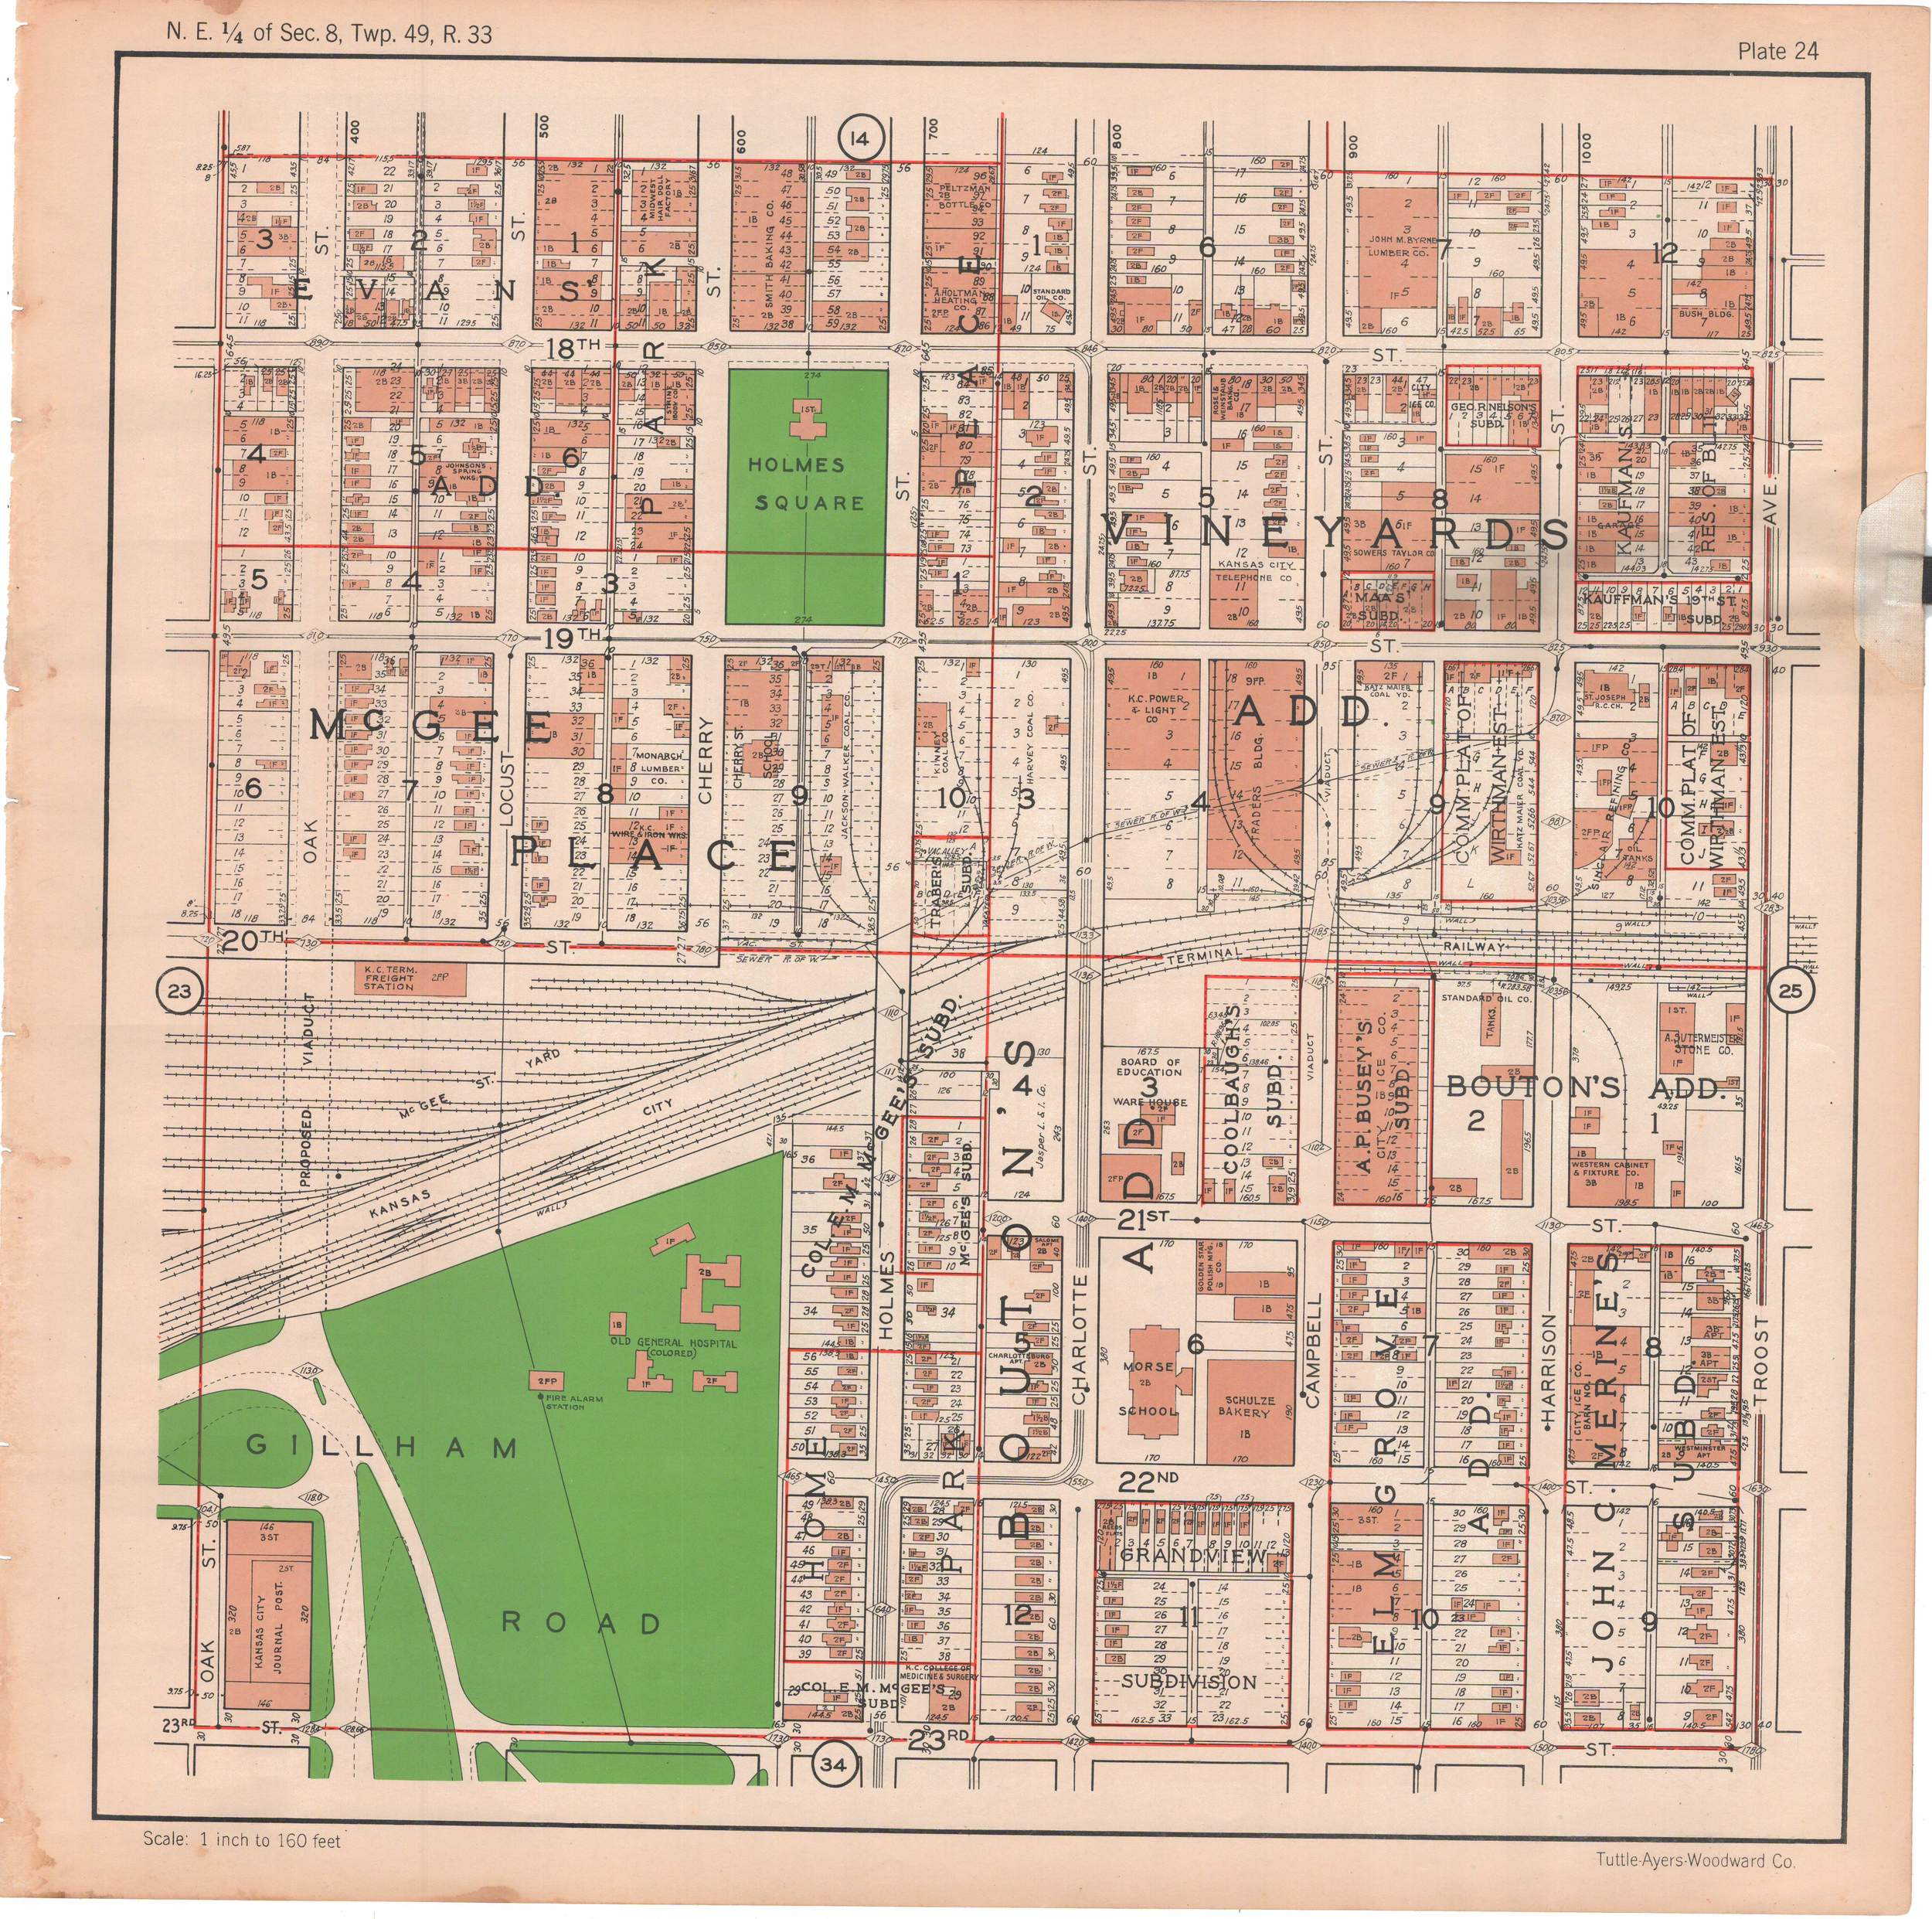 1925 TUTTLE_AYERS_Plate 24.JPG